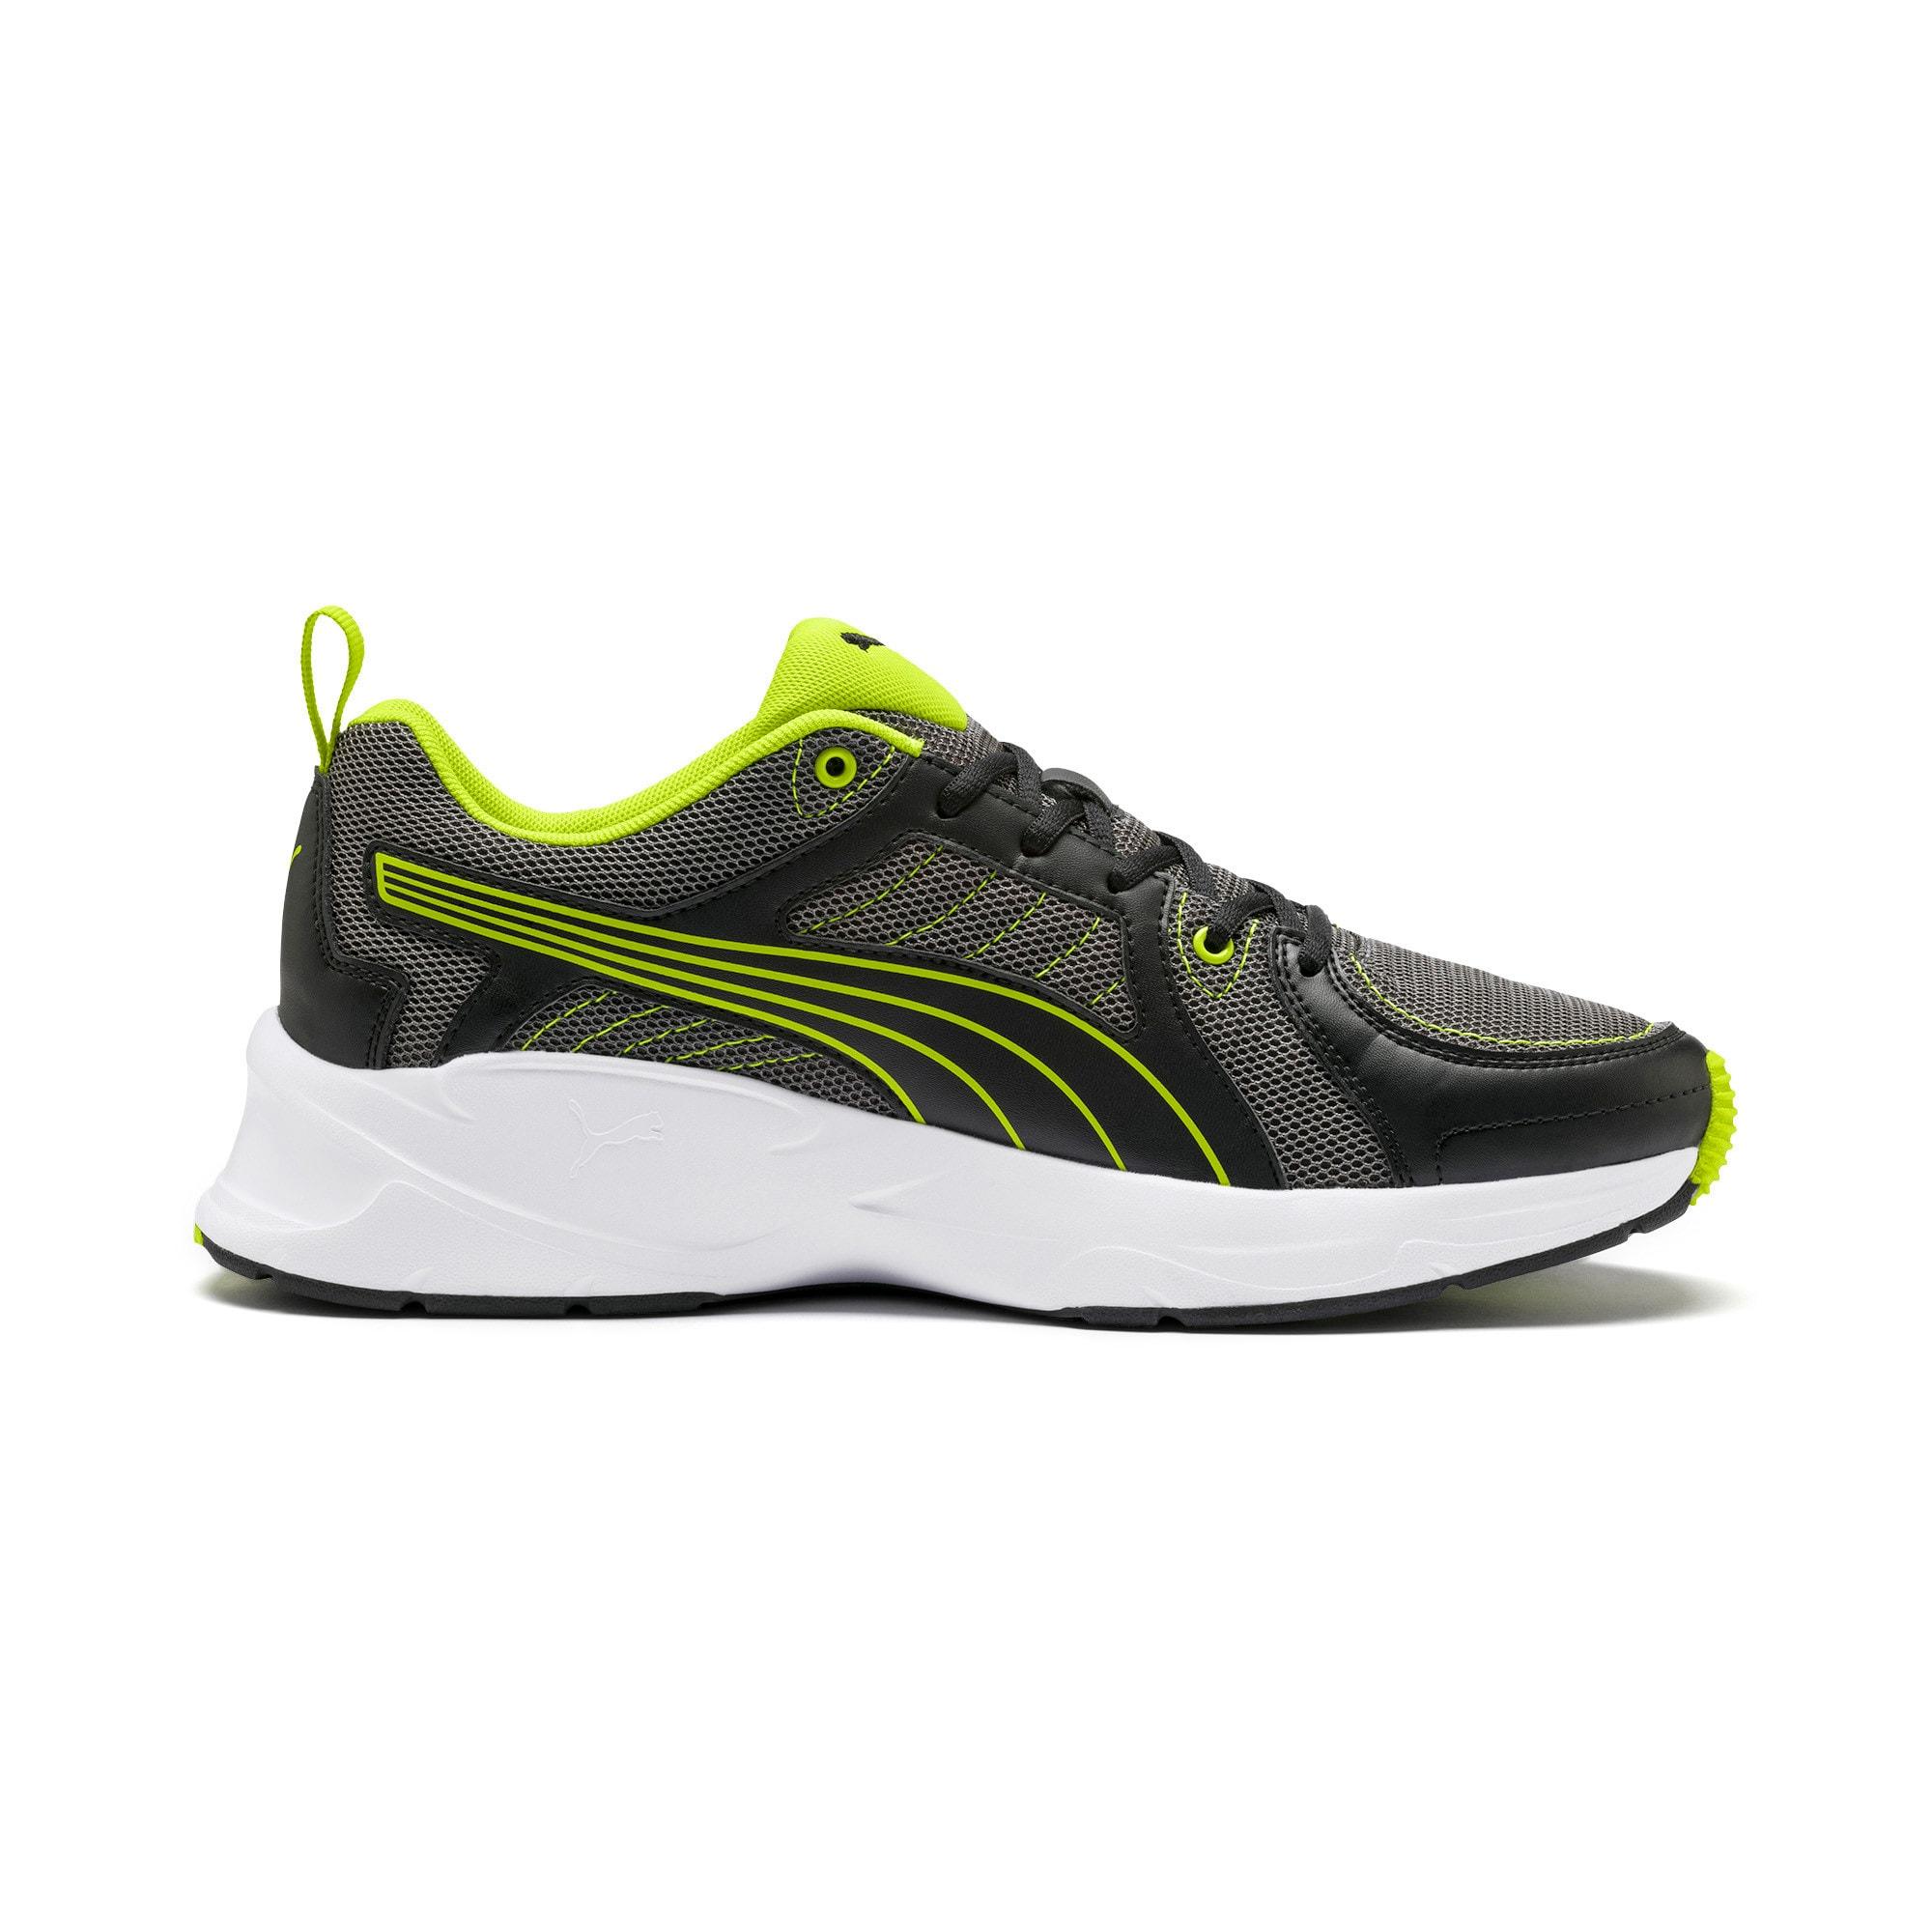 Thumbnail 6 of Nucleus Run Training Shoes, CASTLEROCK-Limepunch, medium